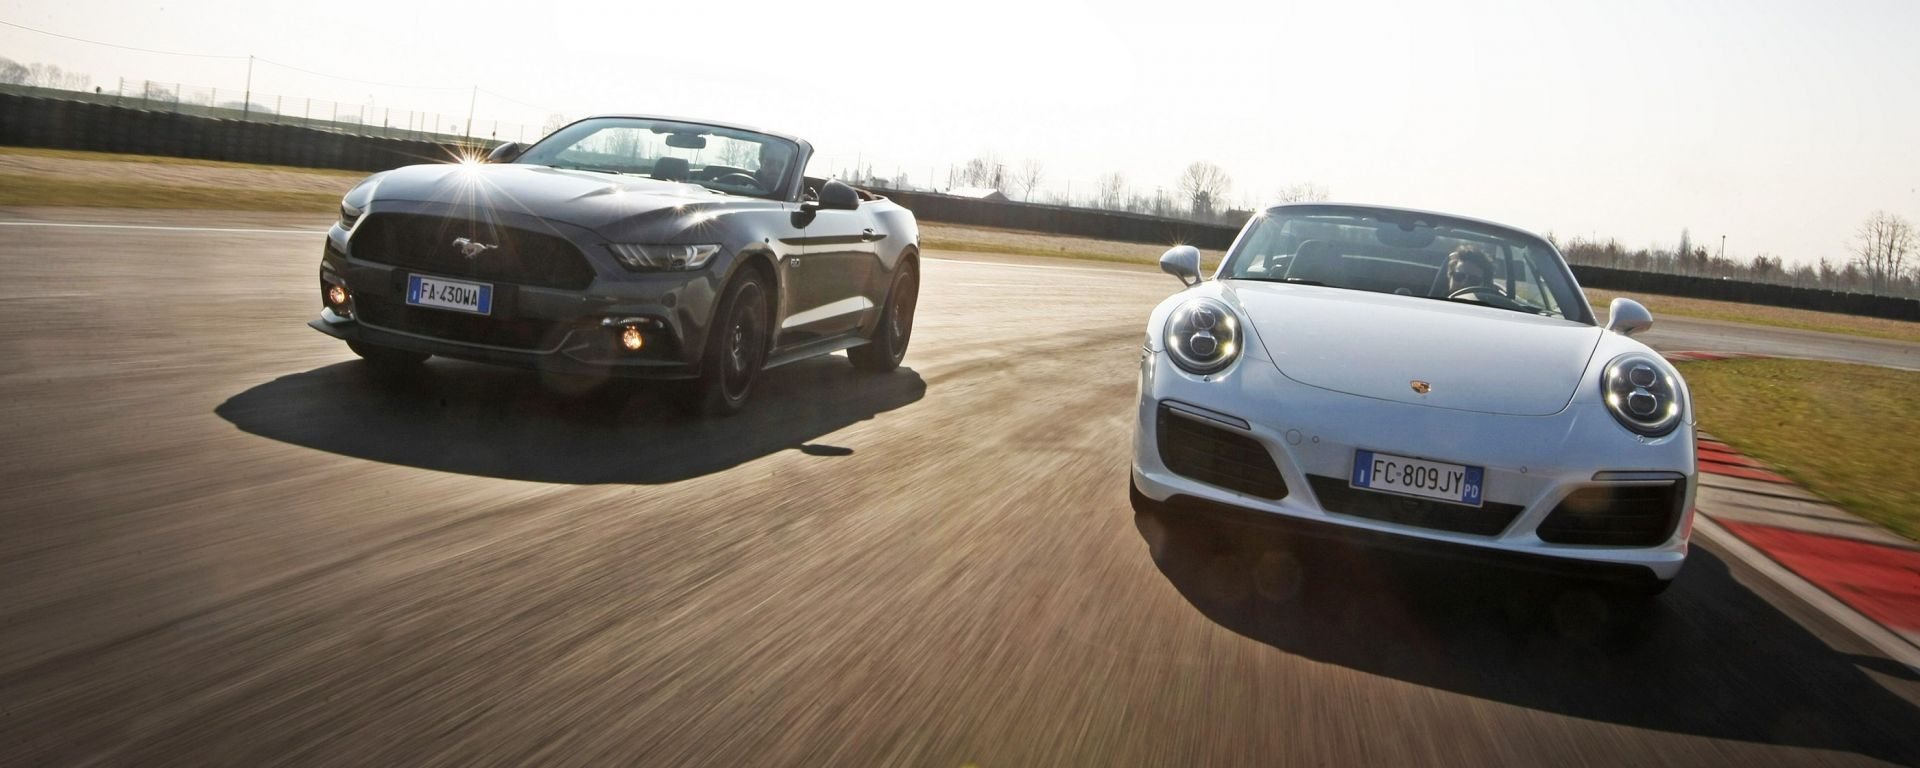 Porsche 911 Carrera 4 Cabrio VS Ford Mustang 5.0 Cabrio